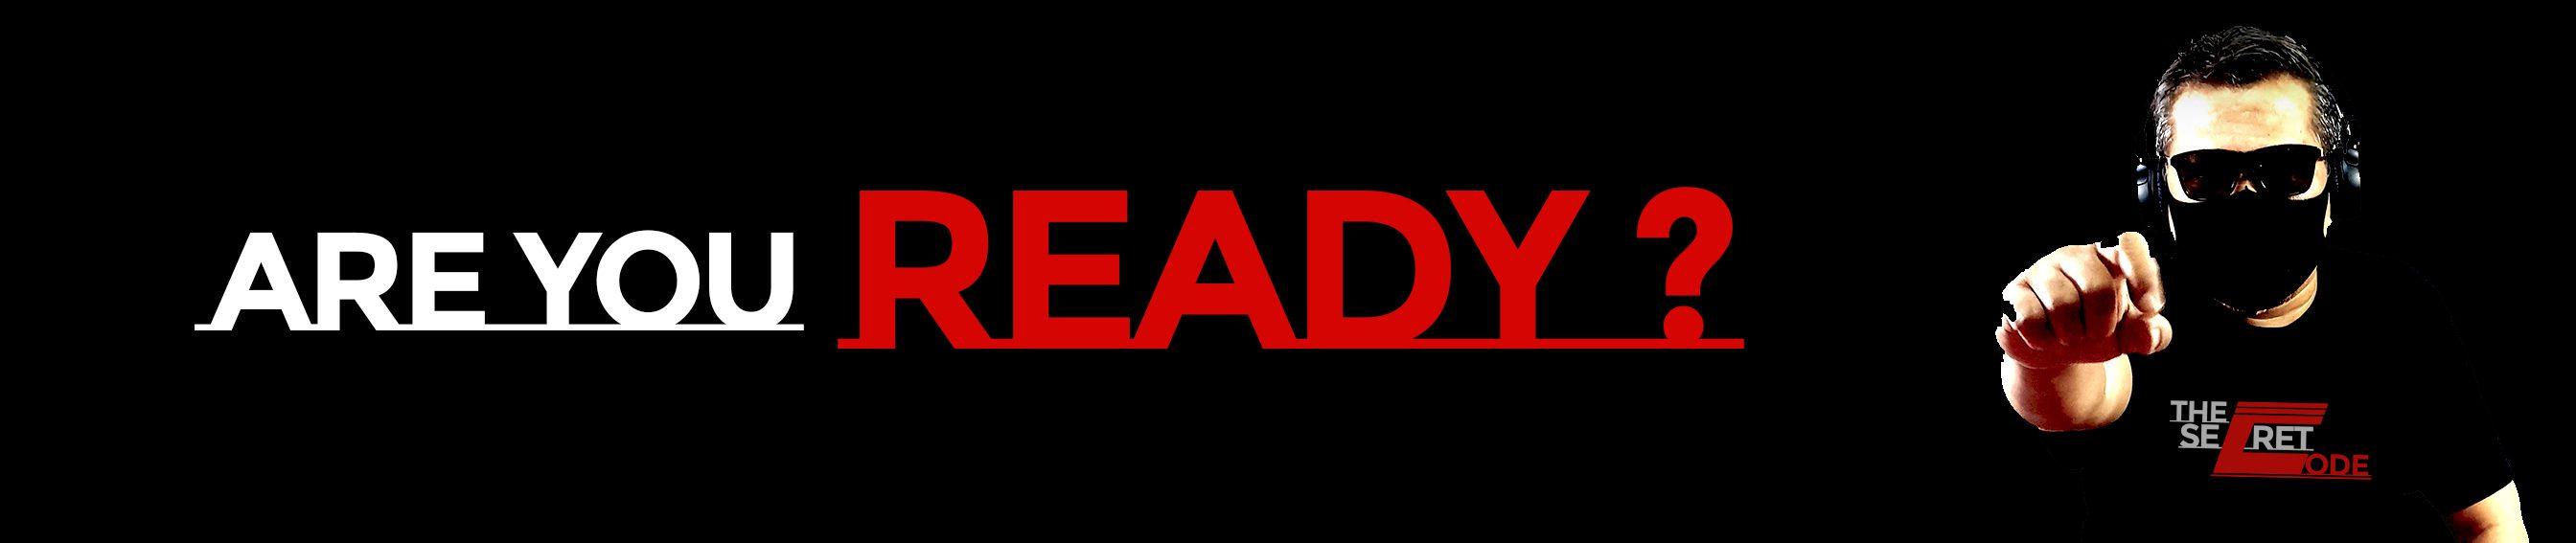 https://www.redavenueindonesia.com/wp-content/uploads/2020/11/Are-You-Ready_Virtual-Team-Building-Jakarta-2688x567.jpg